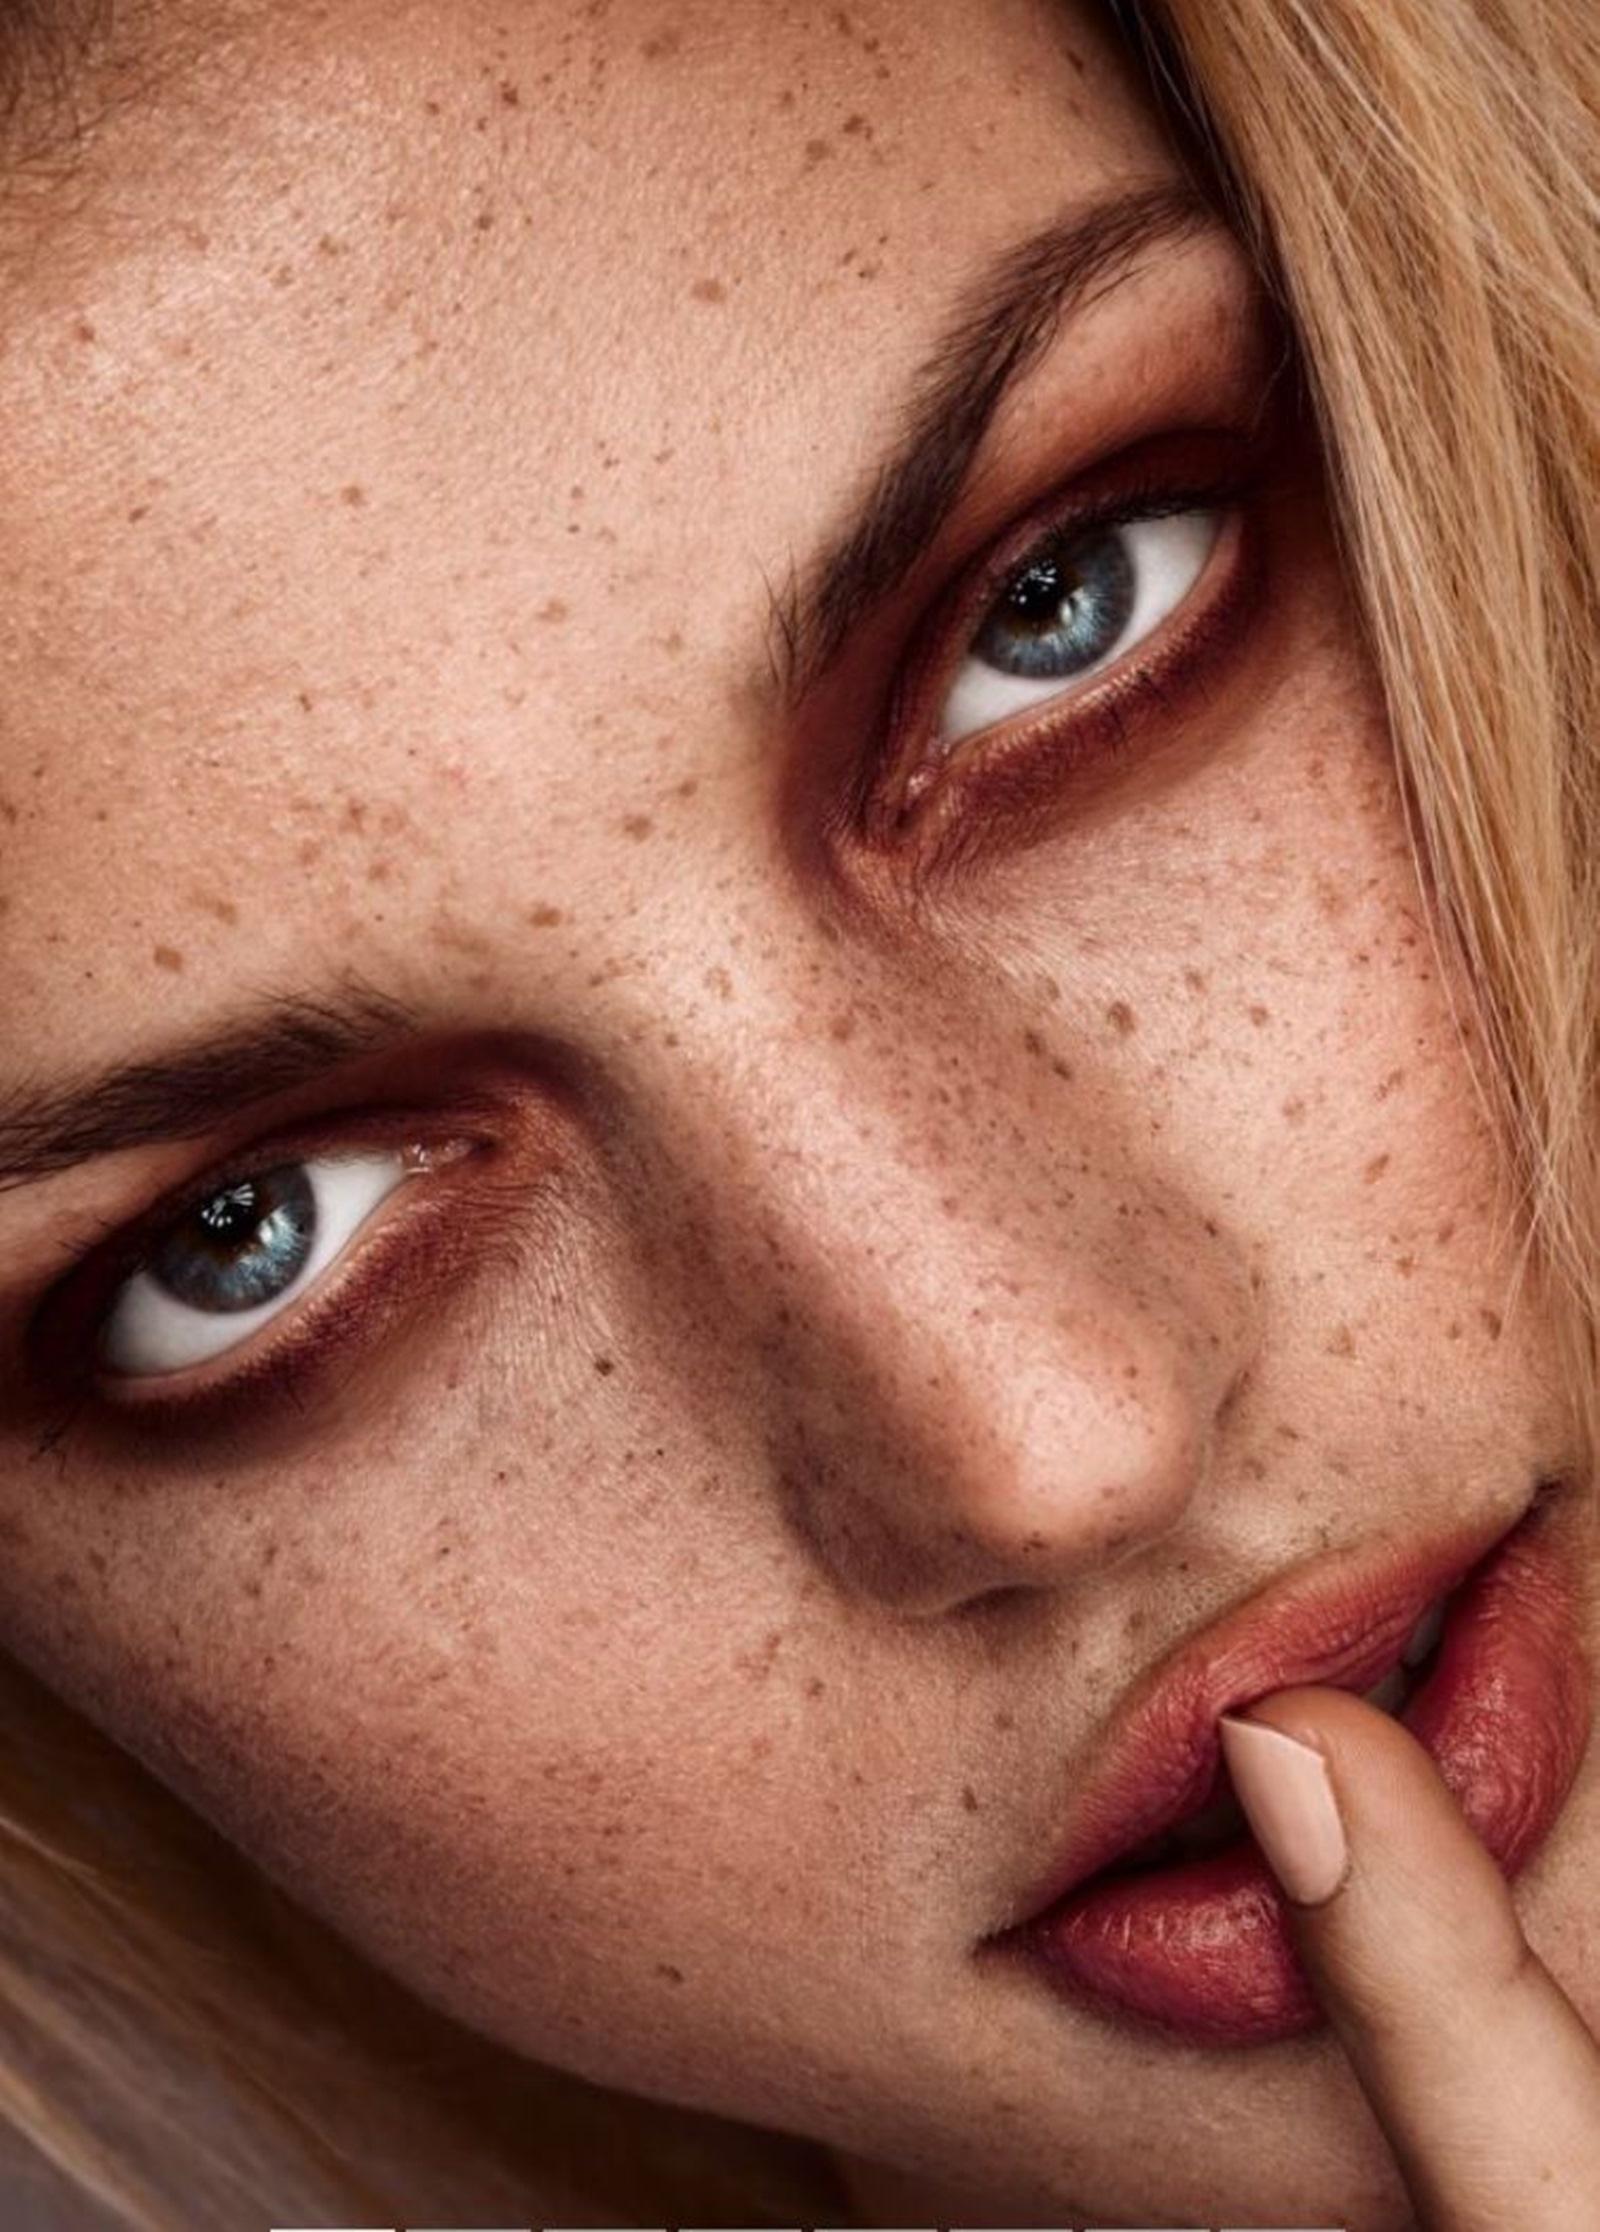 Make Up by Cooh Zahner